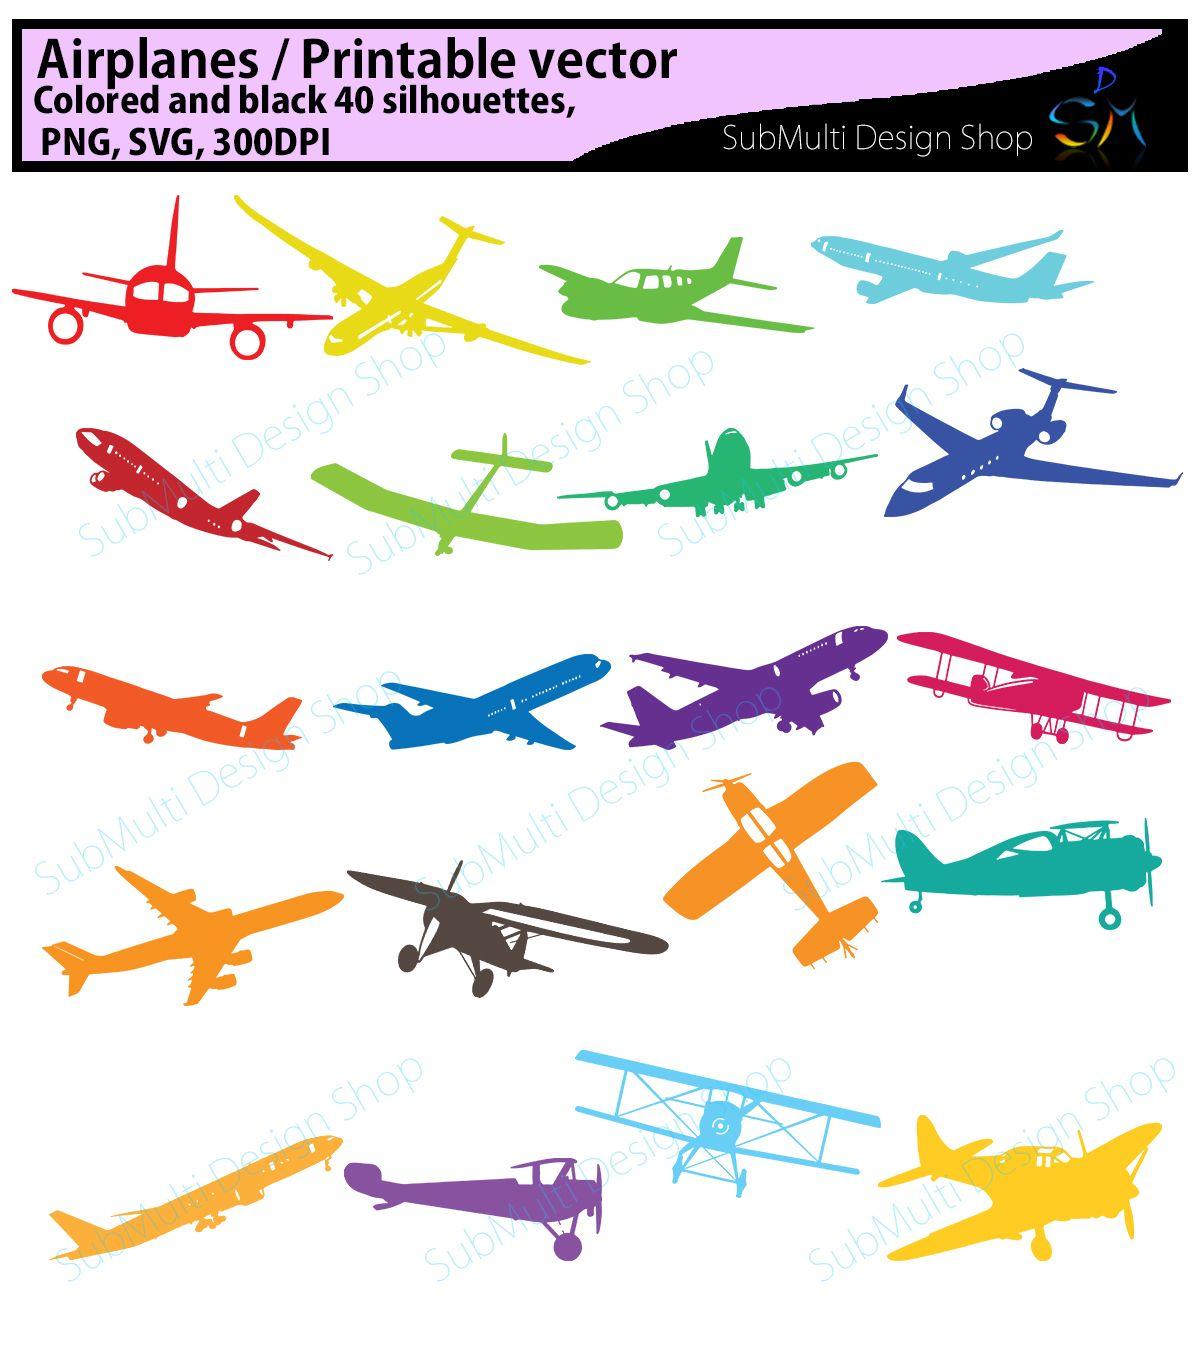 airplane clipart svg airplane airplane clipart airplane craft airplane graphics airplane silhouette cricut cut files design fly logo minimal  [ 1200 x 1348 Pixel ]